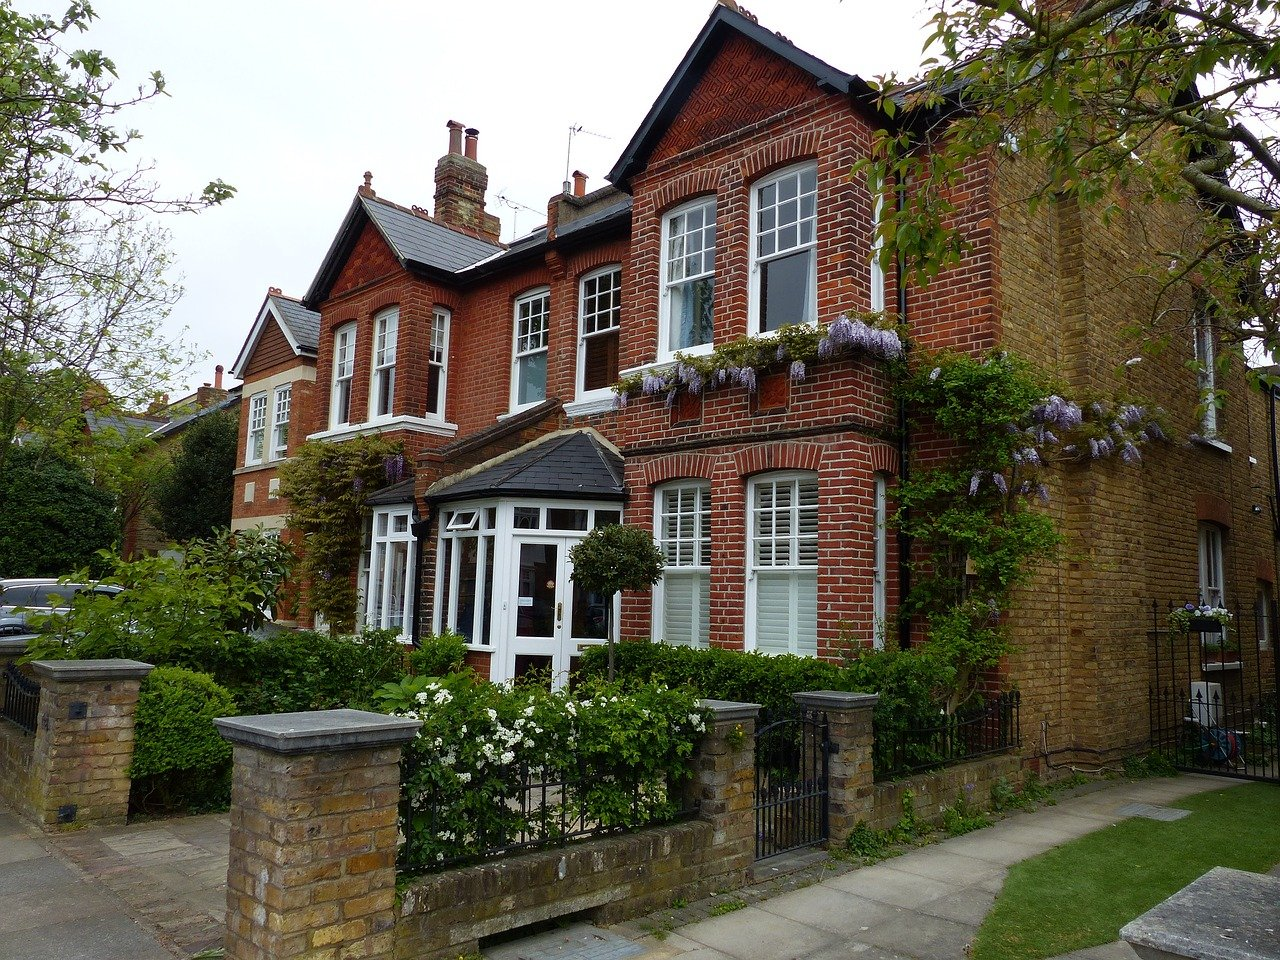 Victorian-era house with red-brick facade.